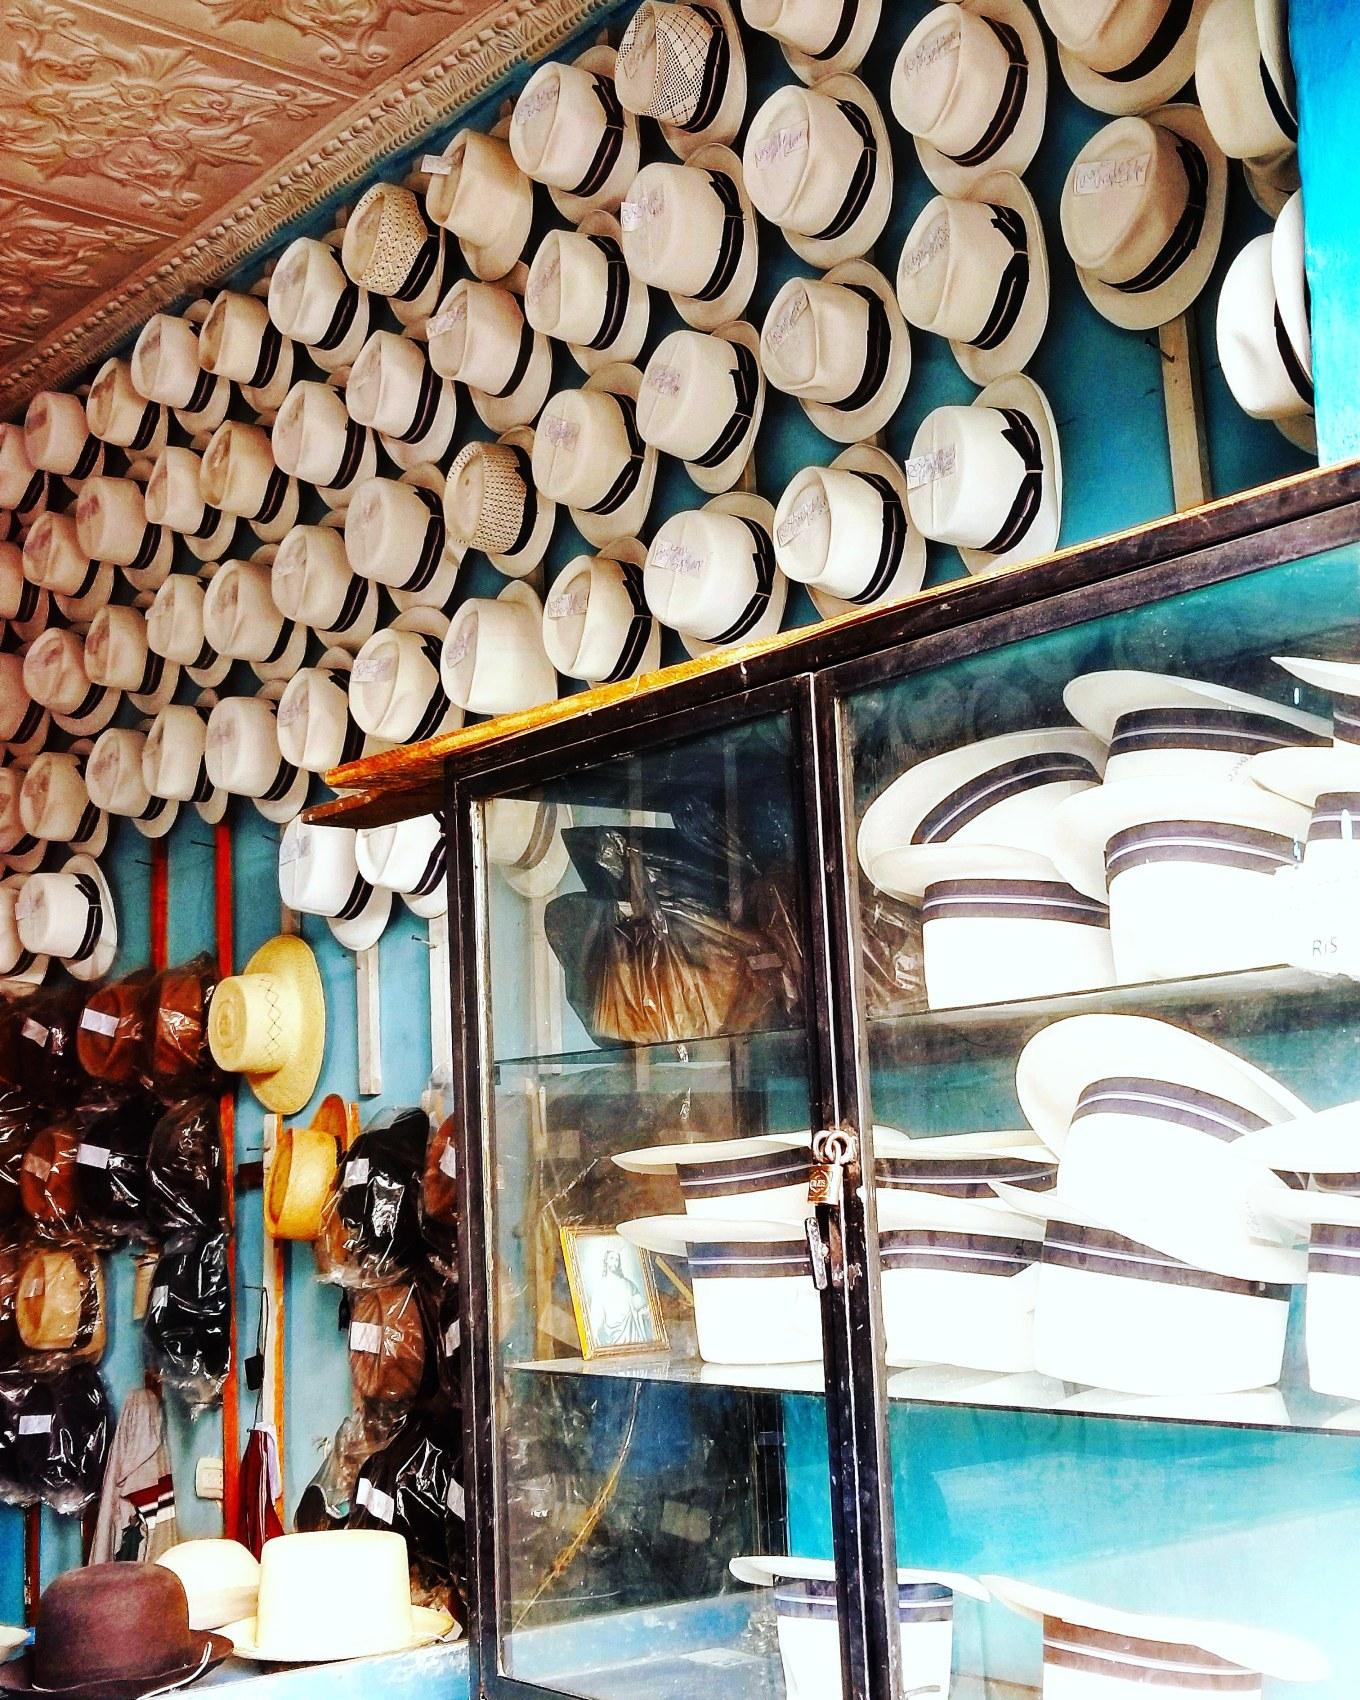 Panama (Toquilla) Hat Shop Cuenca, Ecuador